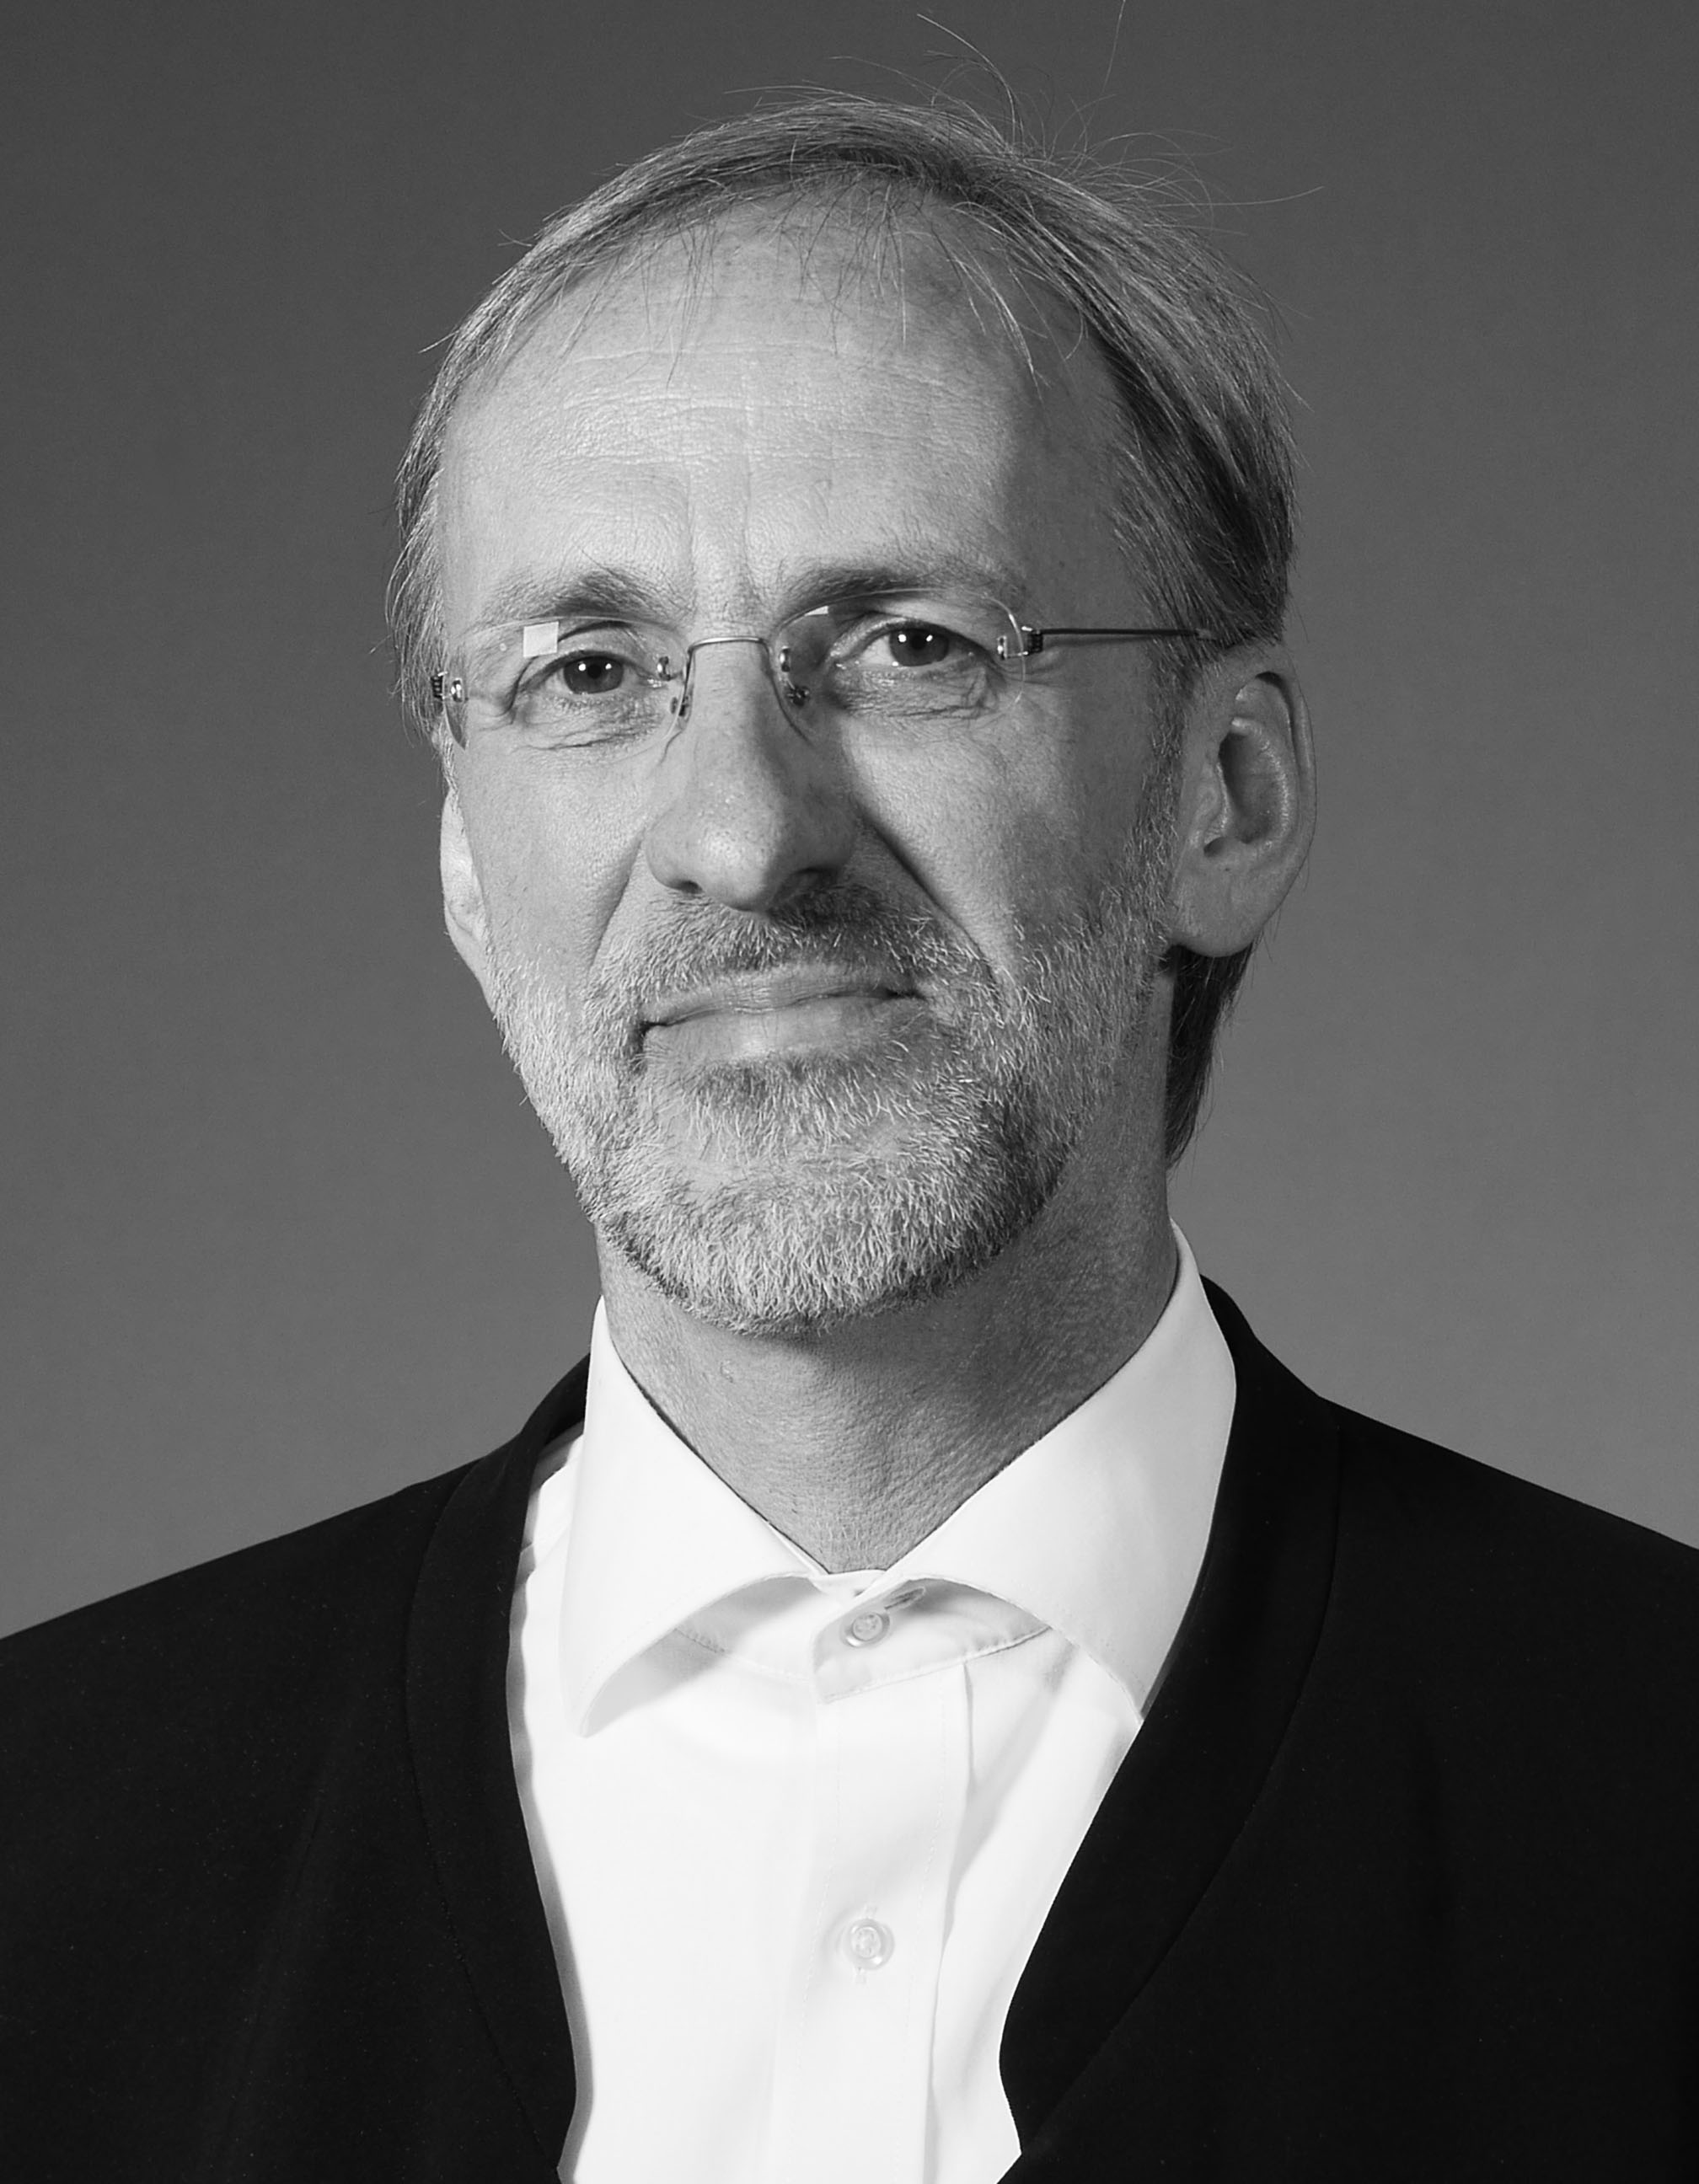 Herr Nacken Profilbild